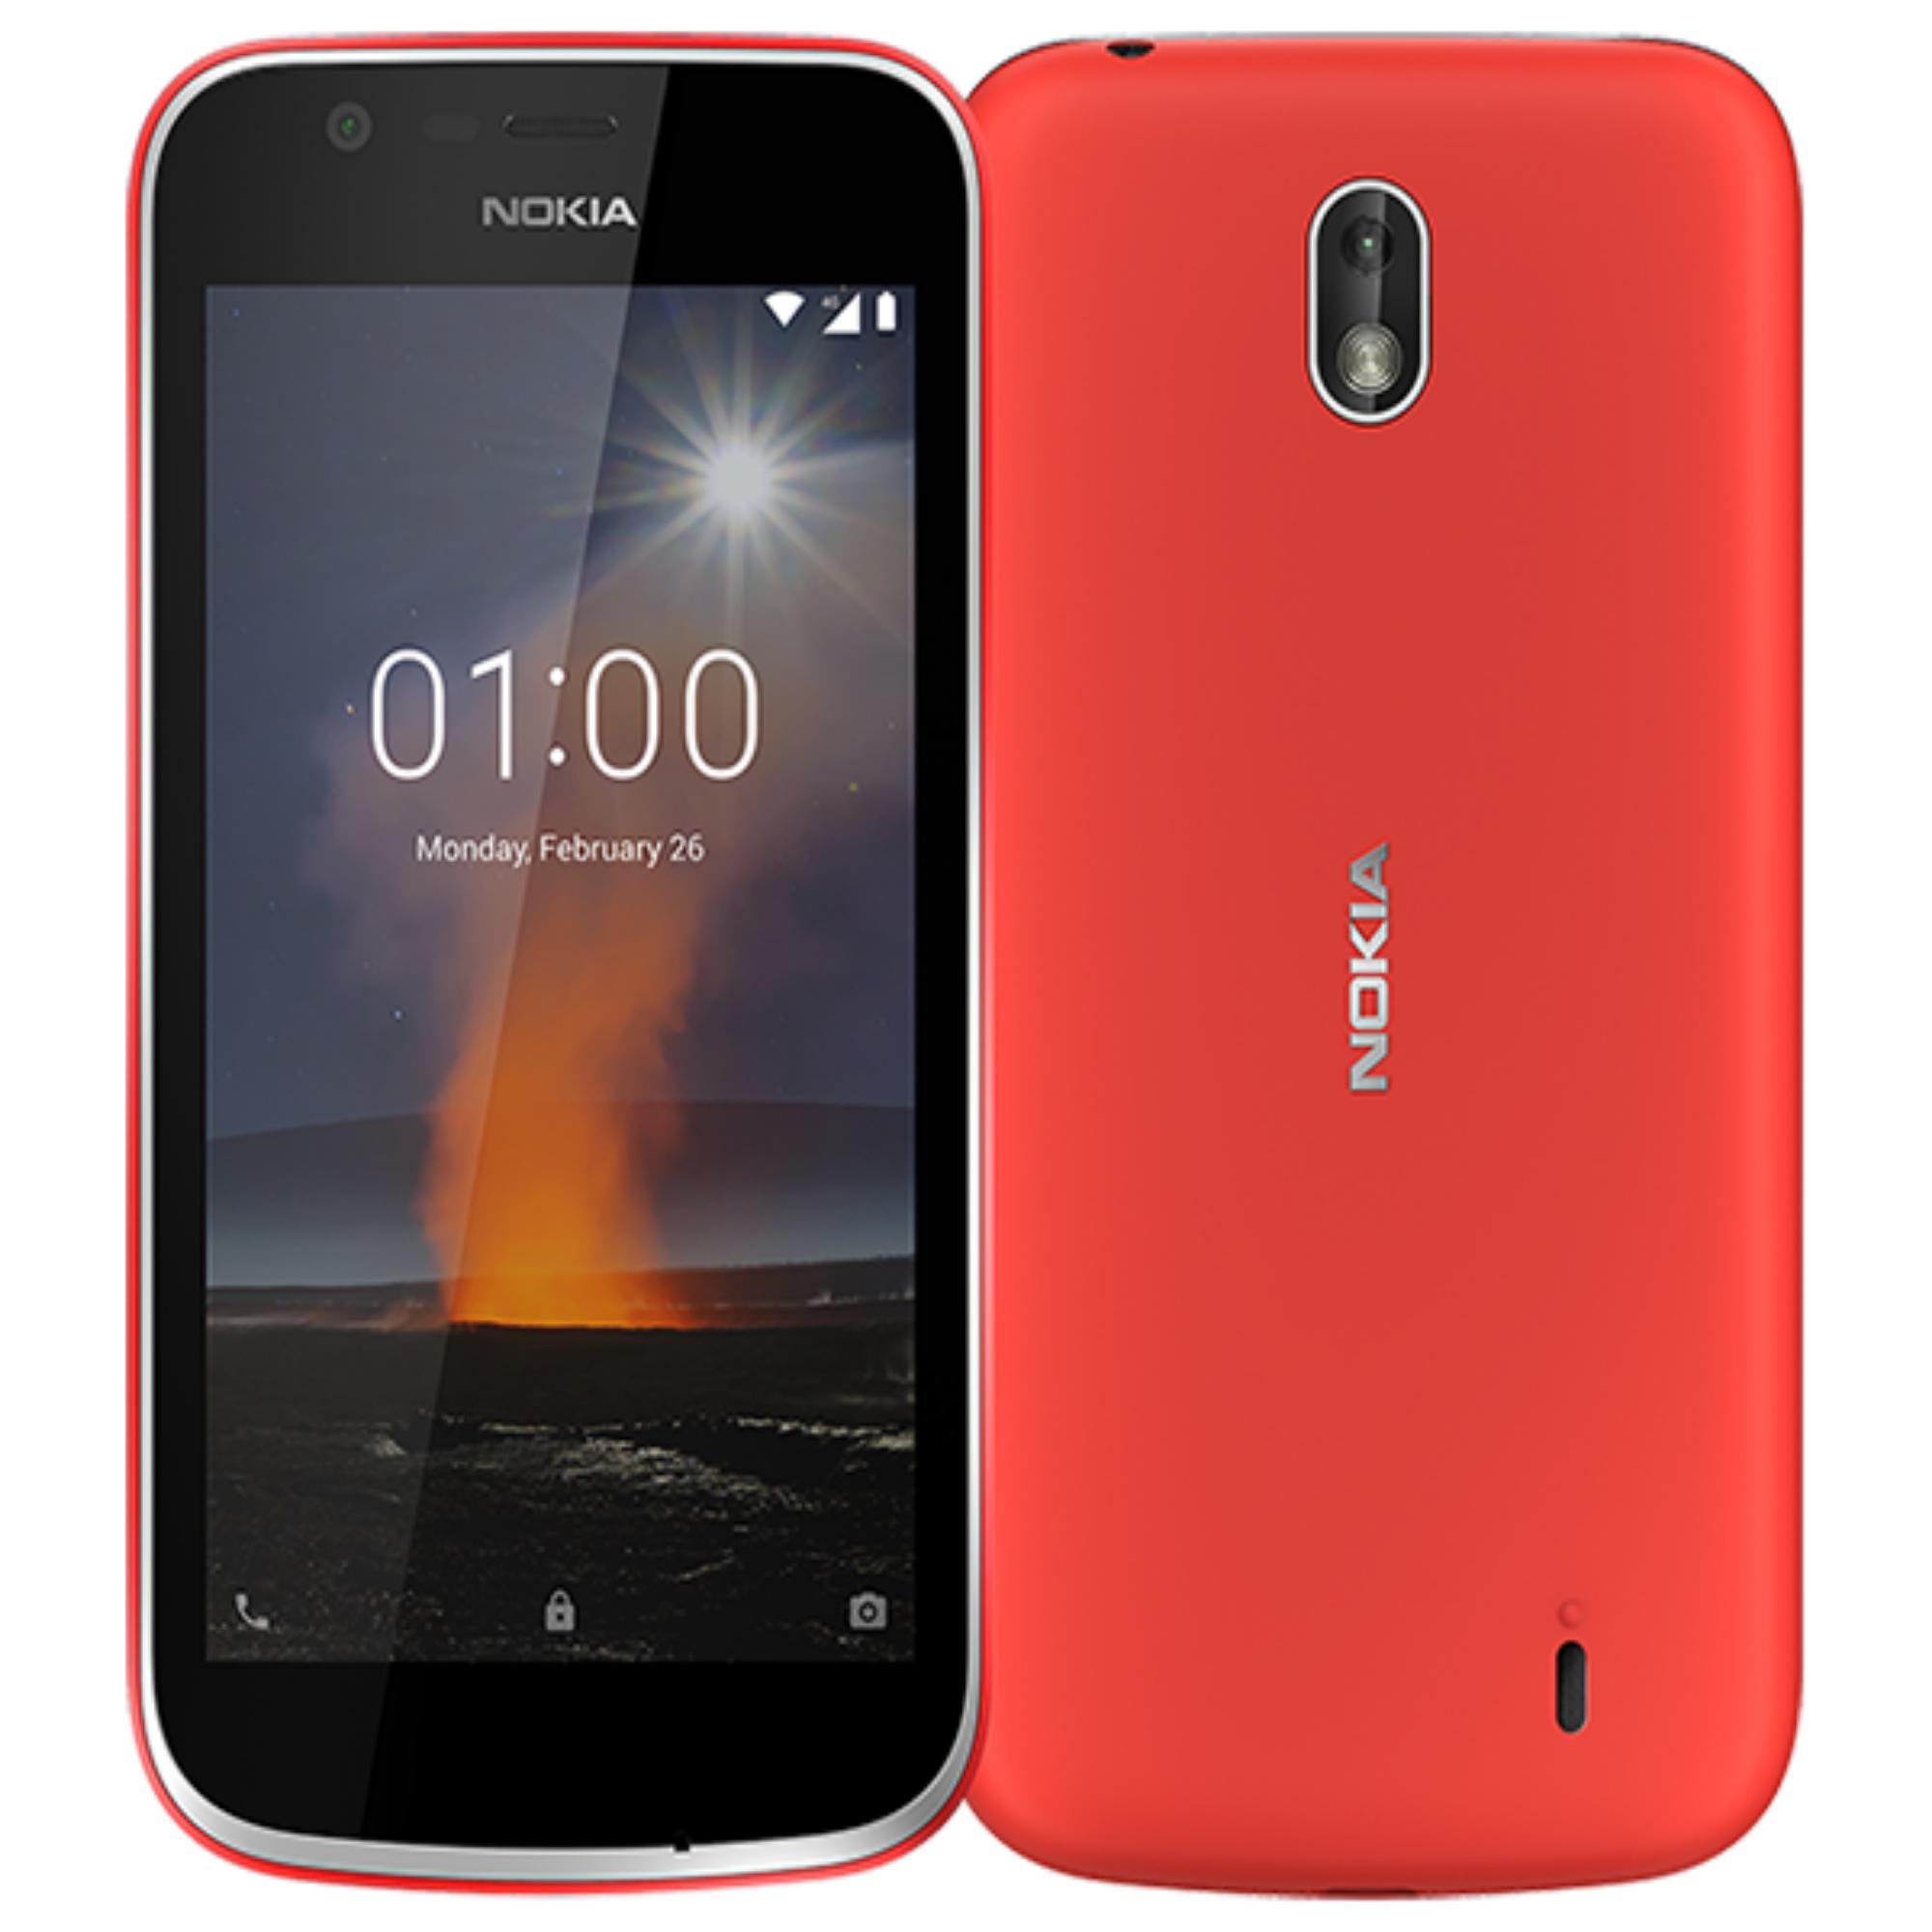 Buy Nokia Mobiles Online Cheap Prices In Pakistan N97 Mini Service Manual 1 Red Dual Sim Cemera Advance Telecom Warranty Original